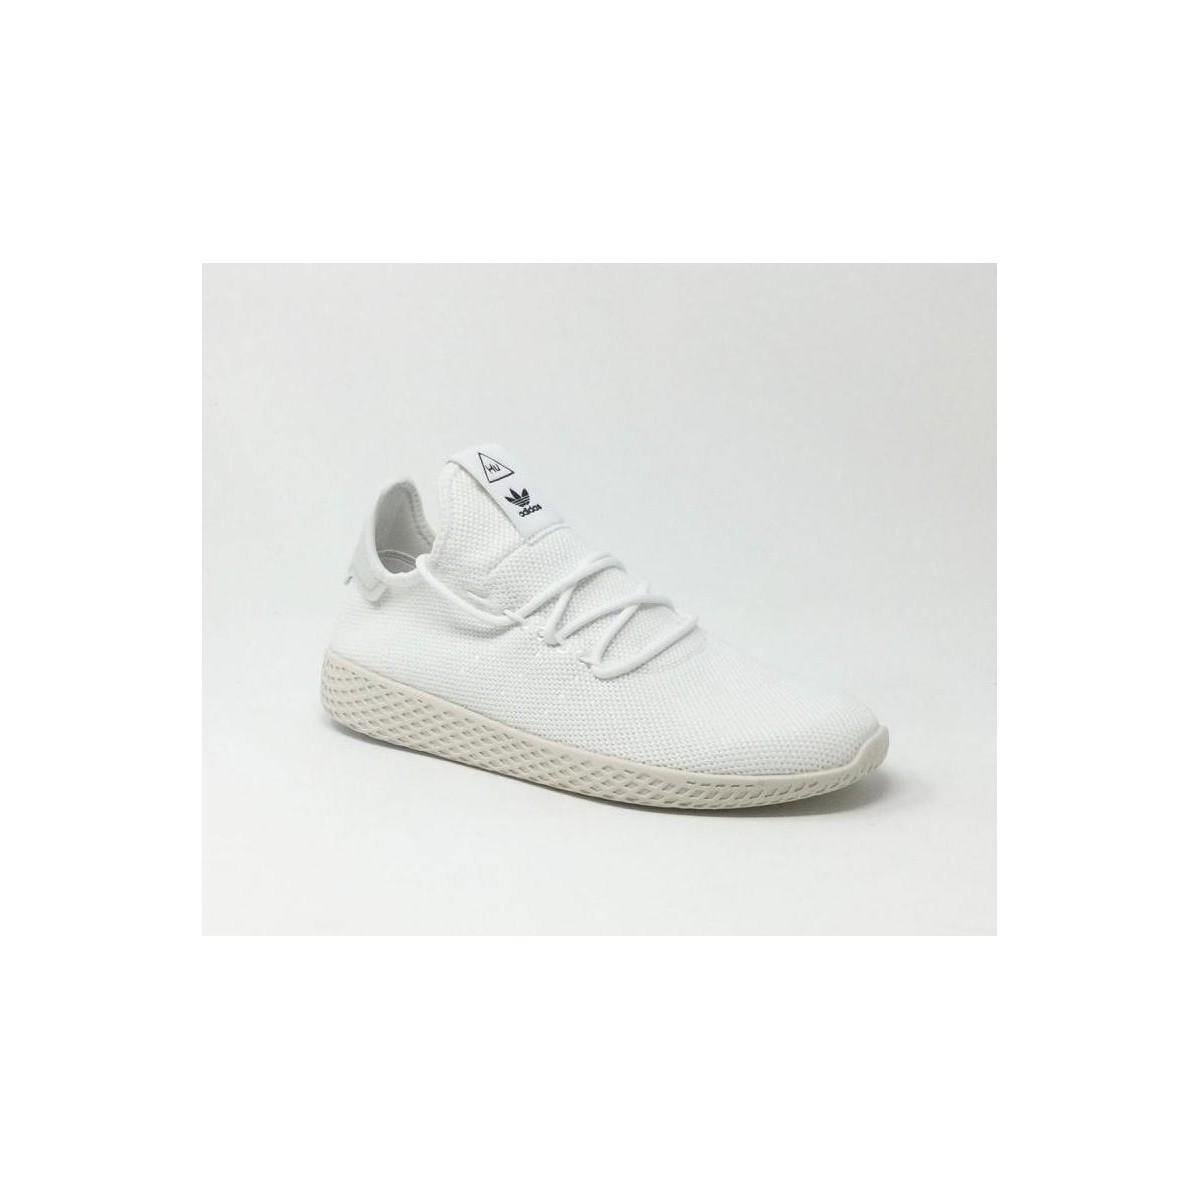 Coloris Tennis Blanc Chaussures En Femmes Pw Adidas rthsQd